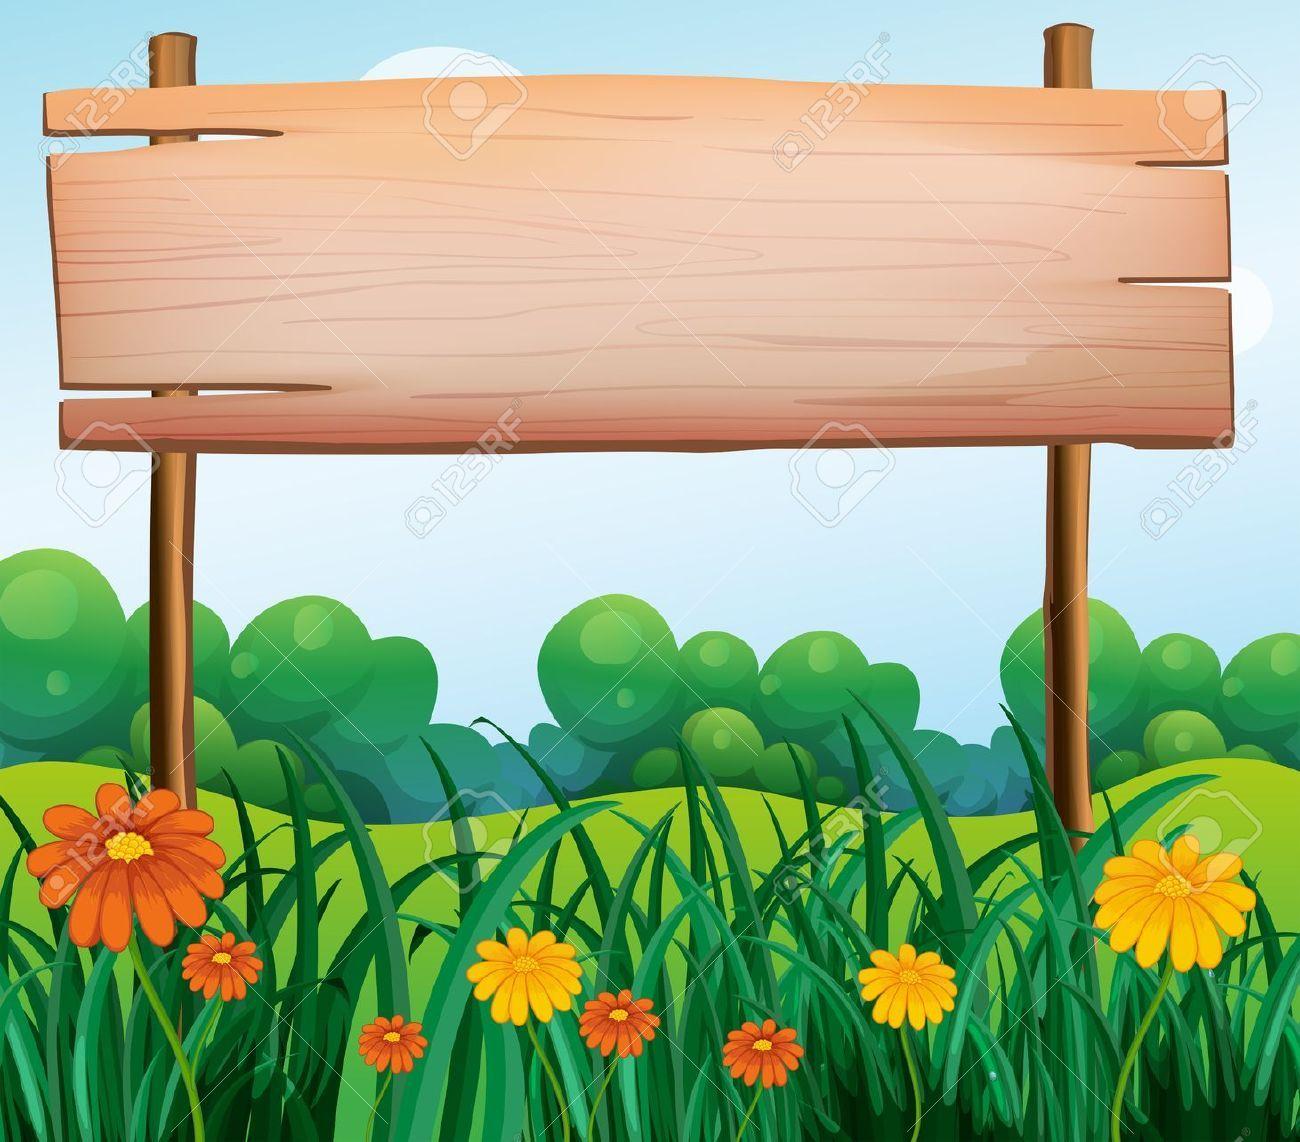 Clip Art Wooden Sign Board In Garden - Google